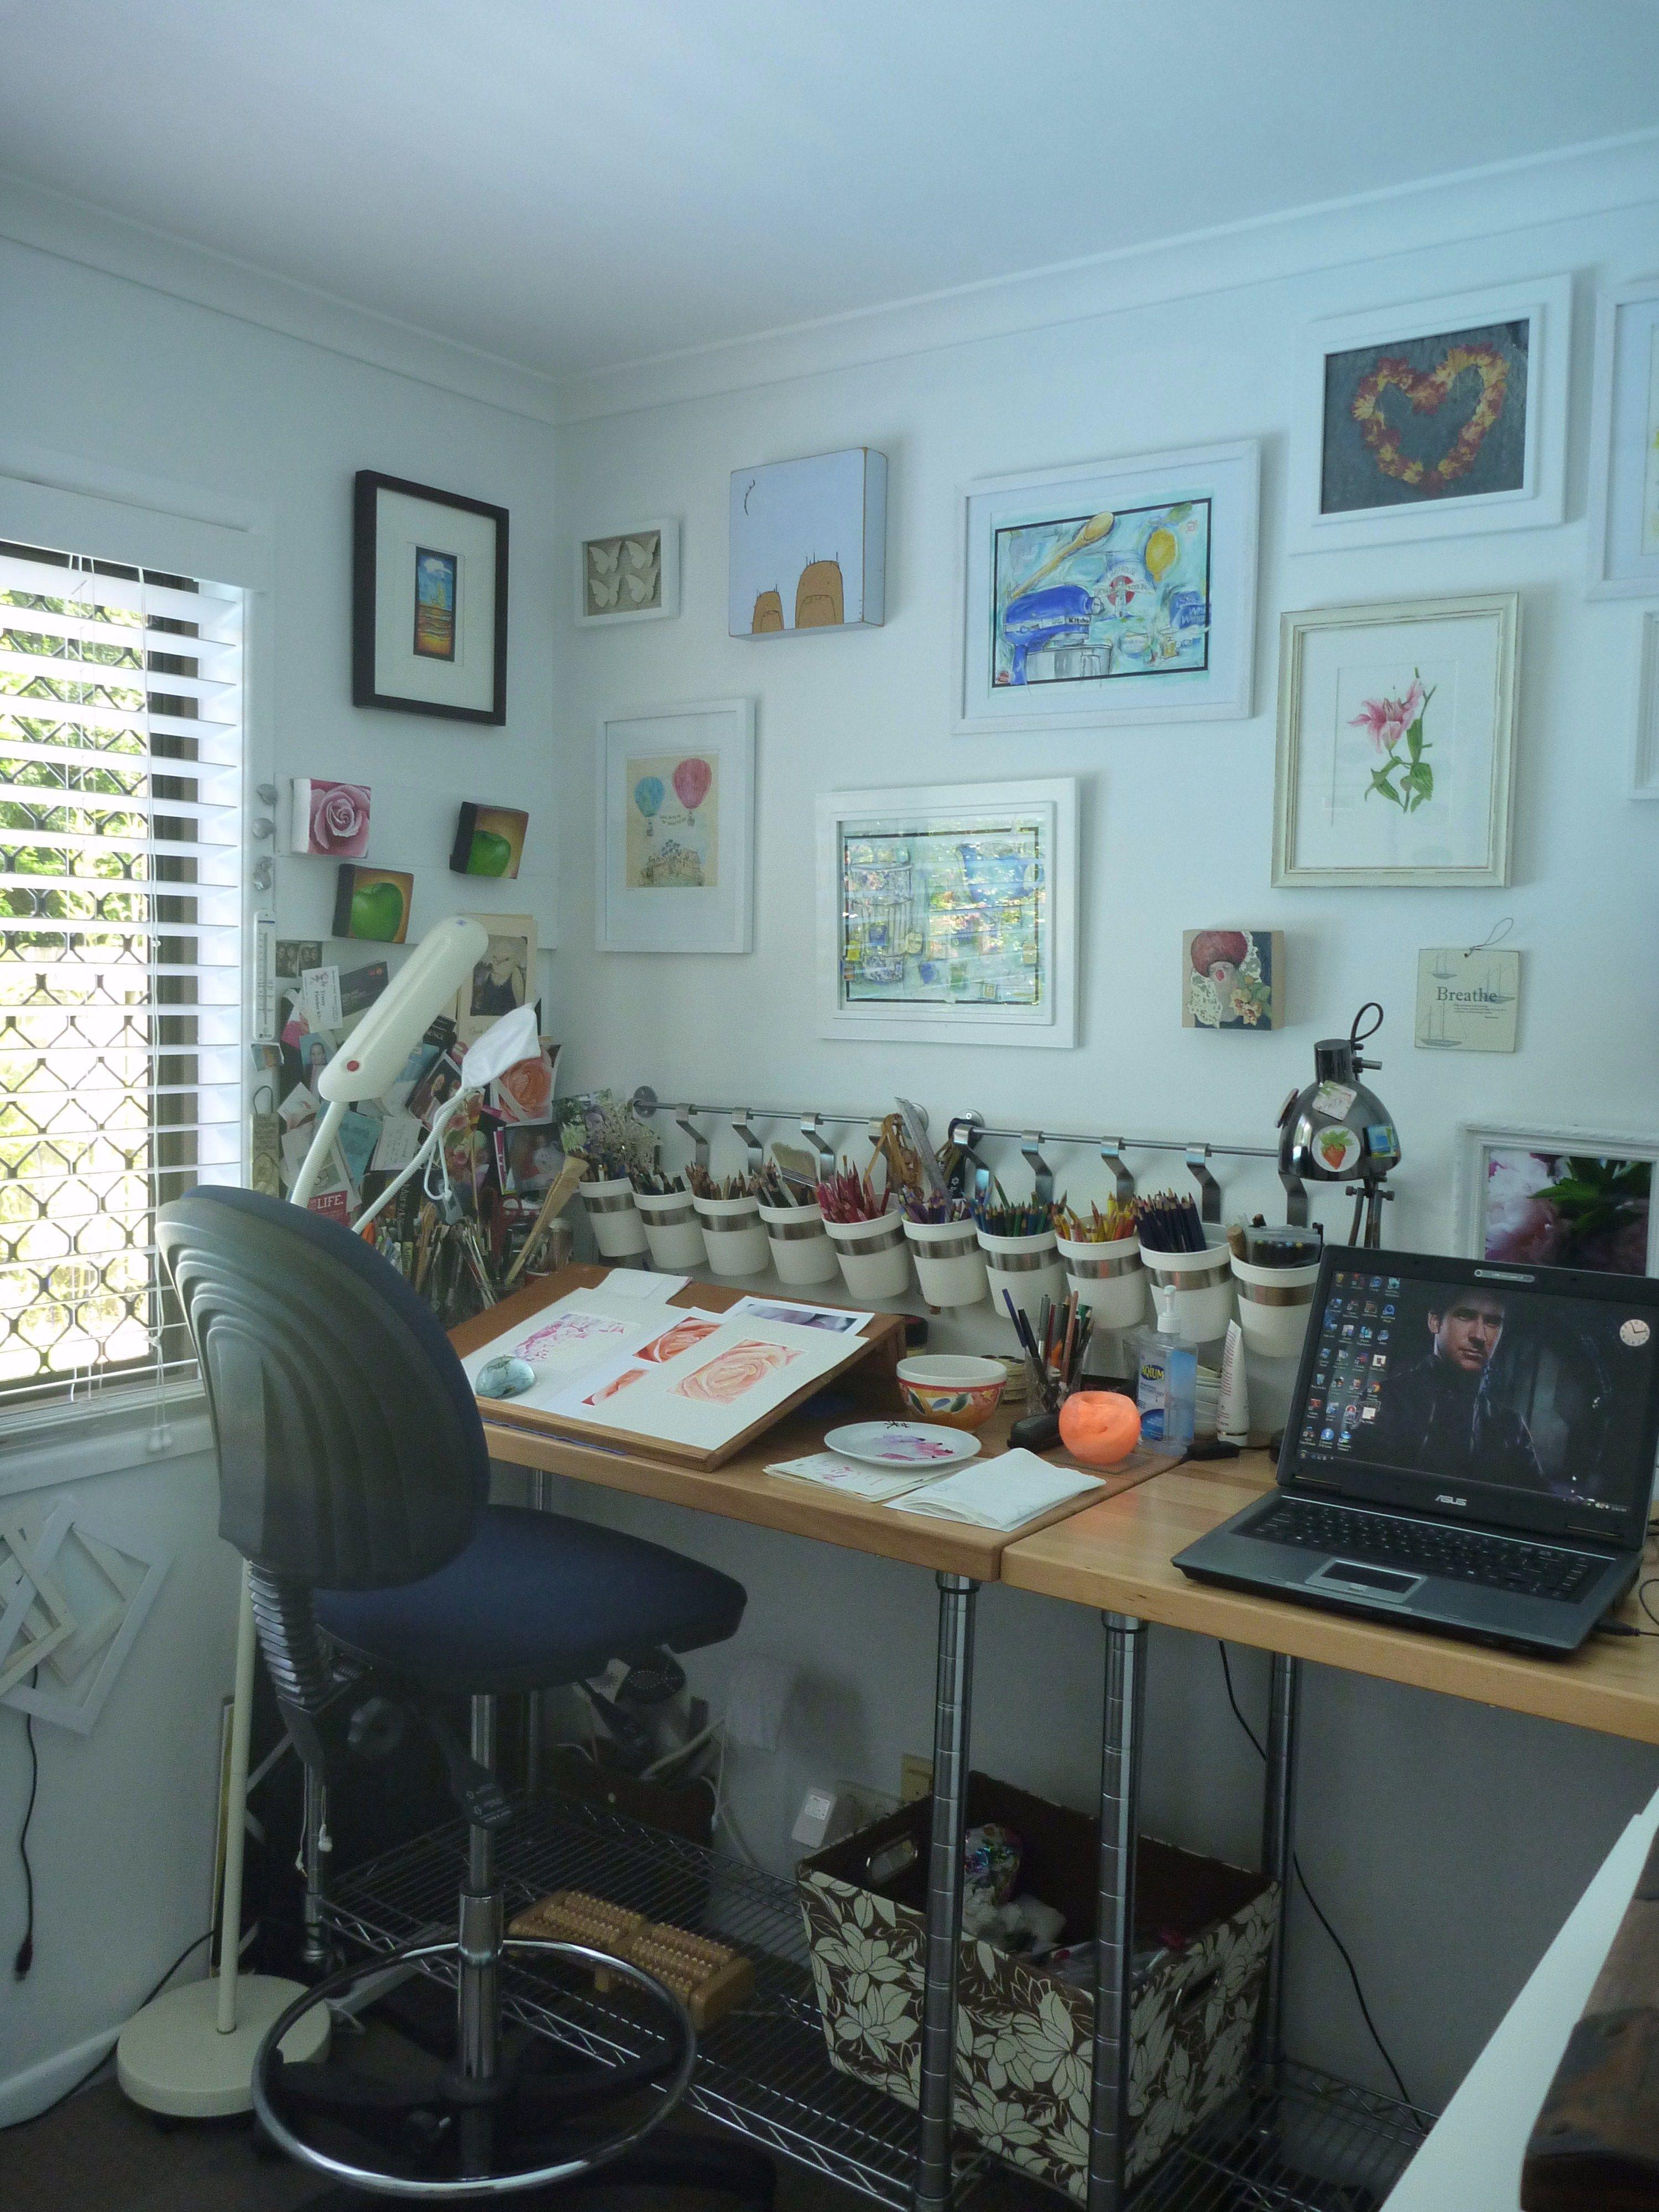 44 Creative Art Studio Organization Ideas for Workspace Desks images